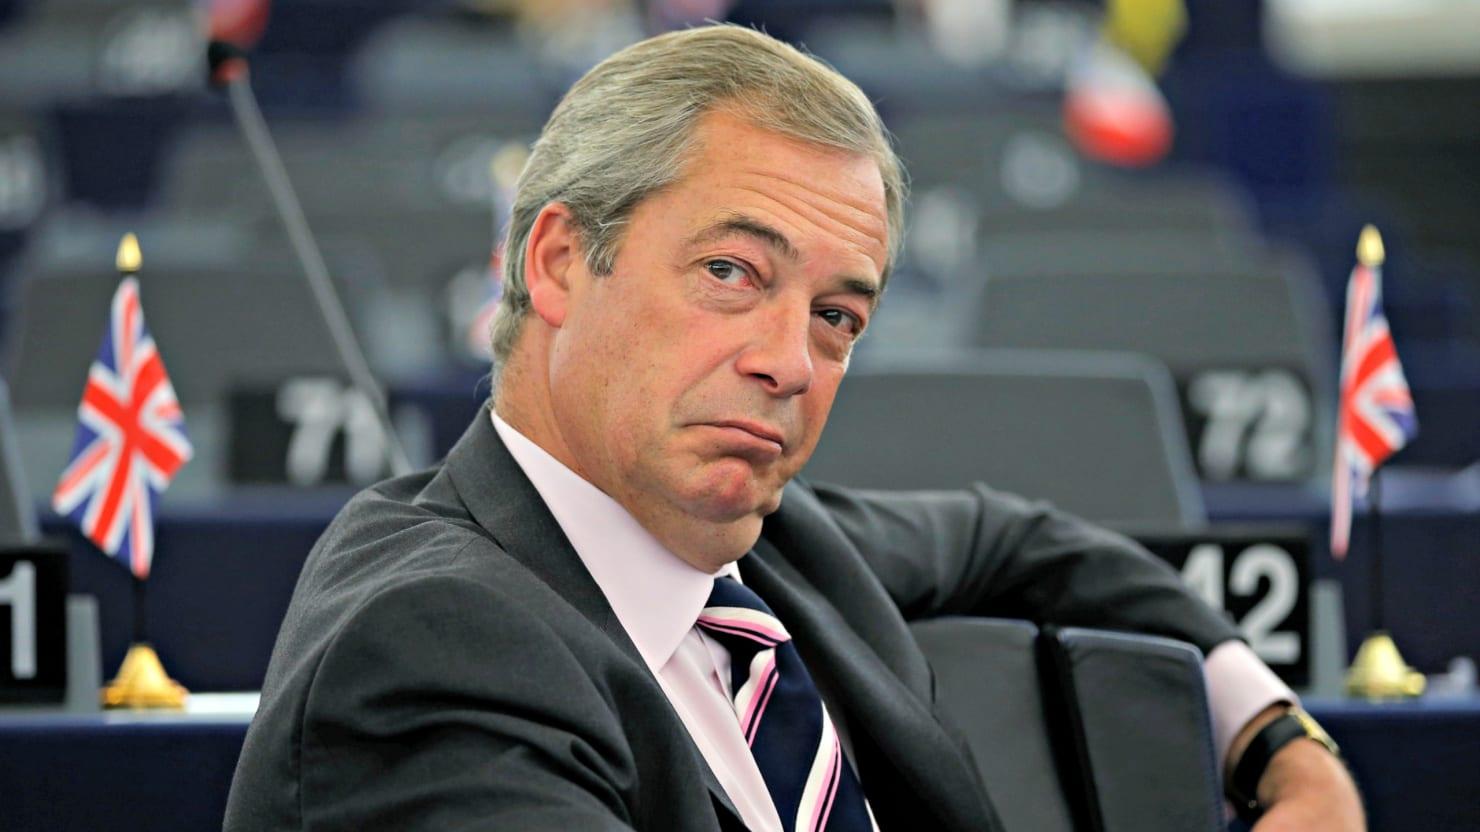 Fox News Hires Nigel Farage